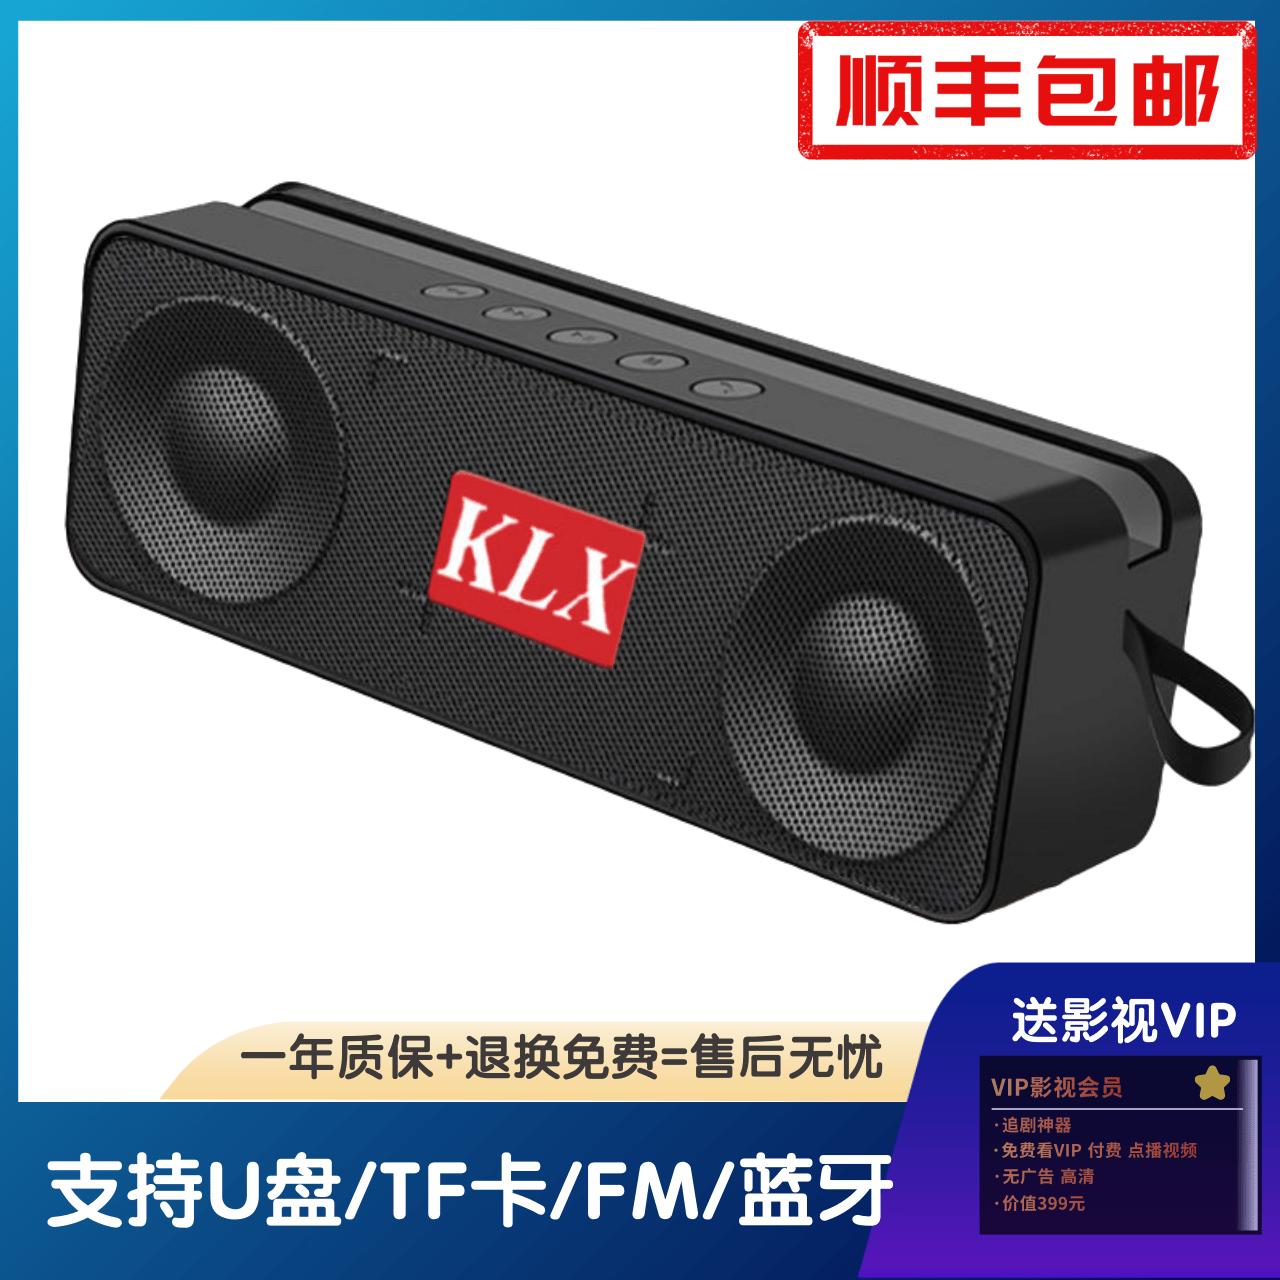 Bluetoothステレオミニスピーカースピーカースピーカースピーカースピーカースピーカーの音声受信放送